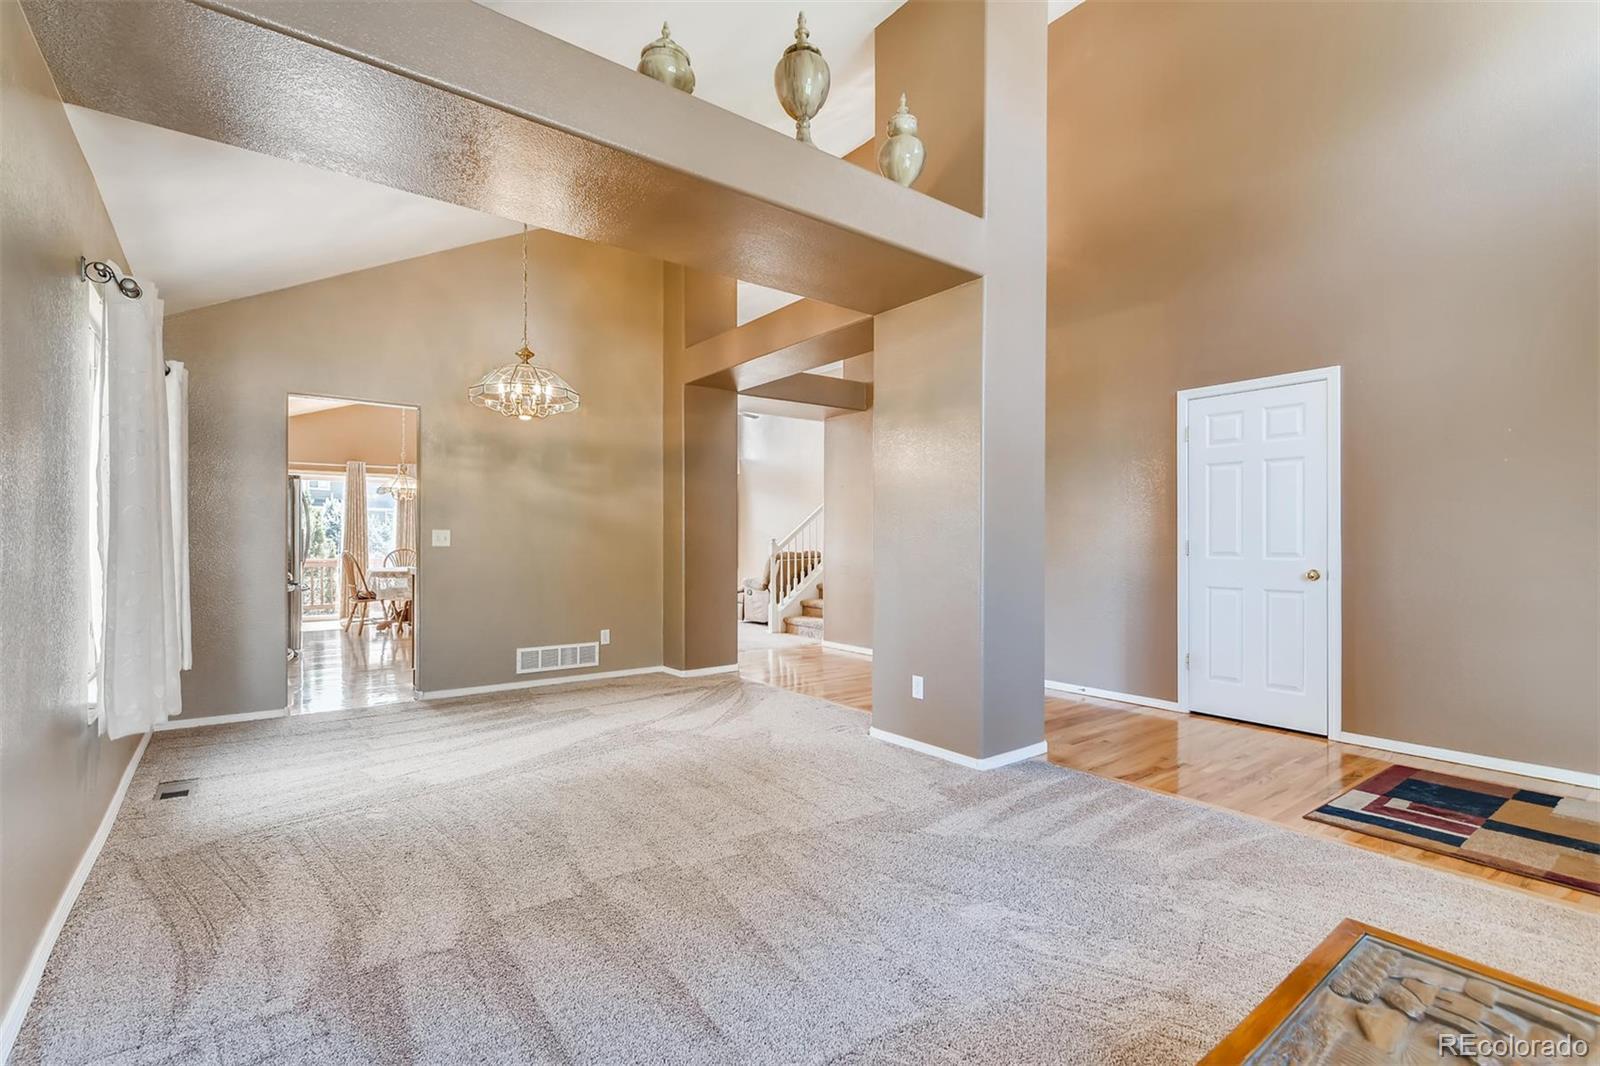 MLS# 9724731 - 8 - 498 Promontory Drive, Loveland, CO 80537